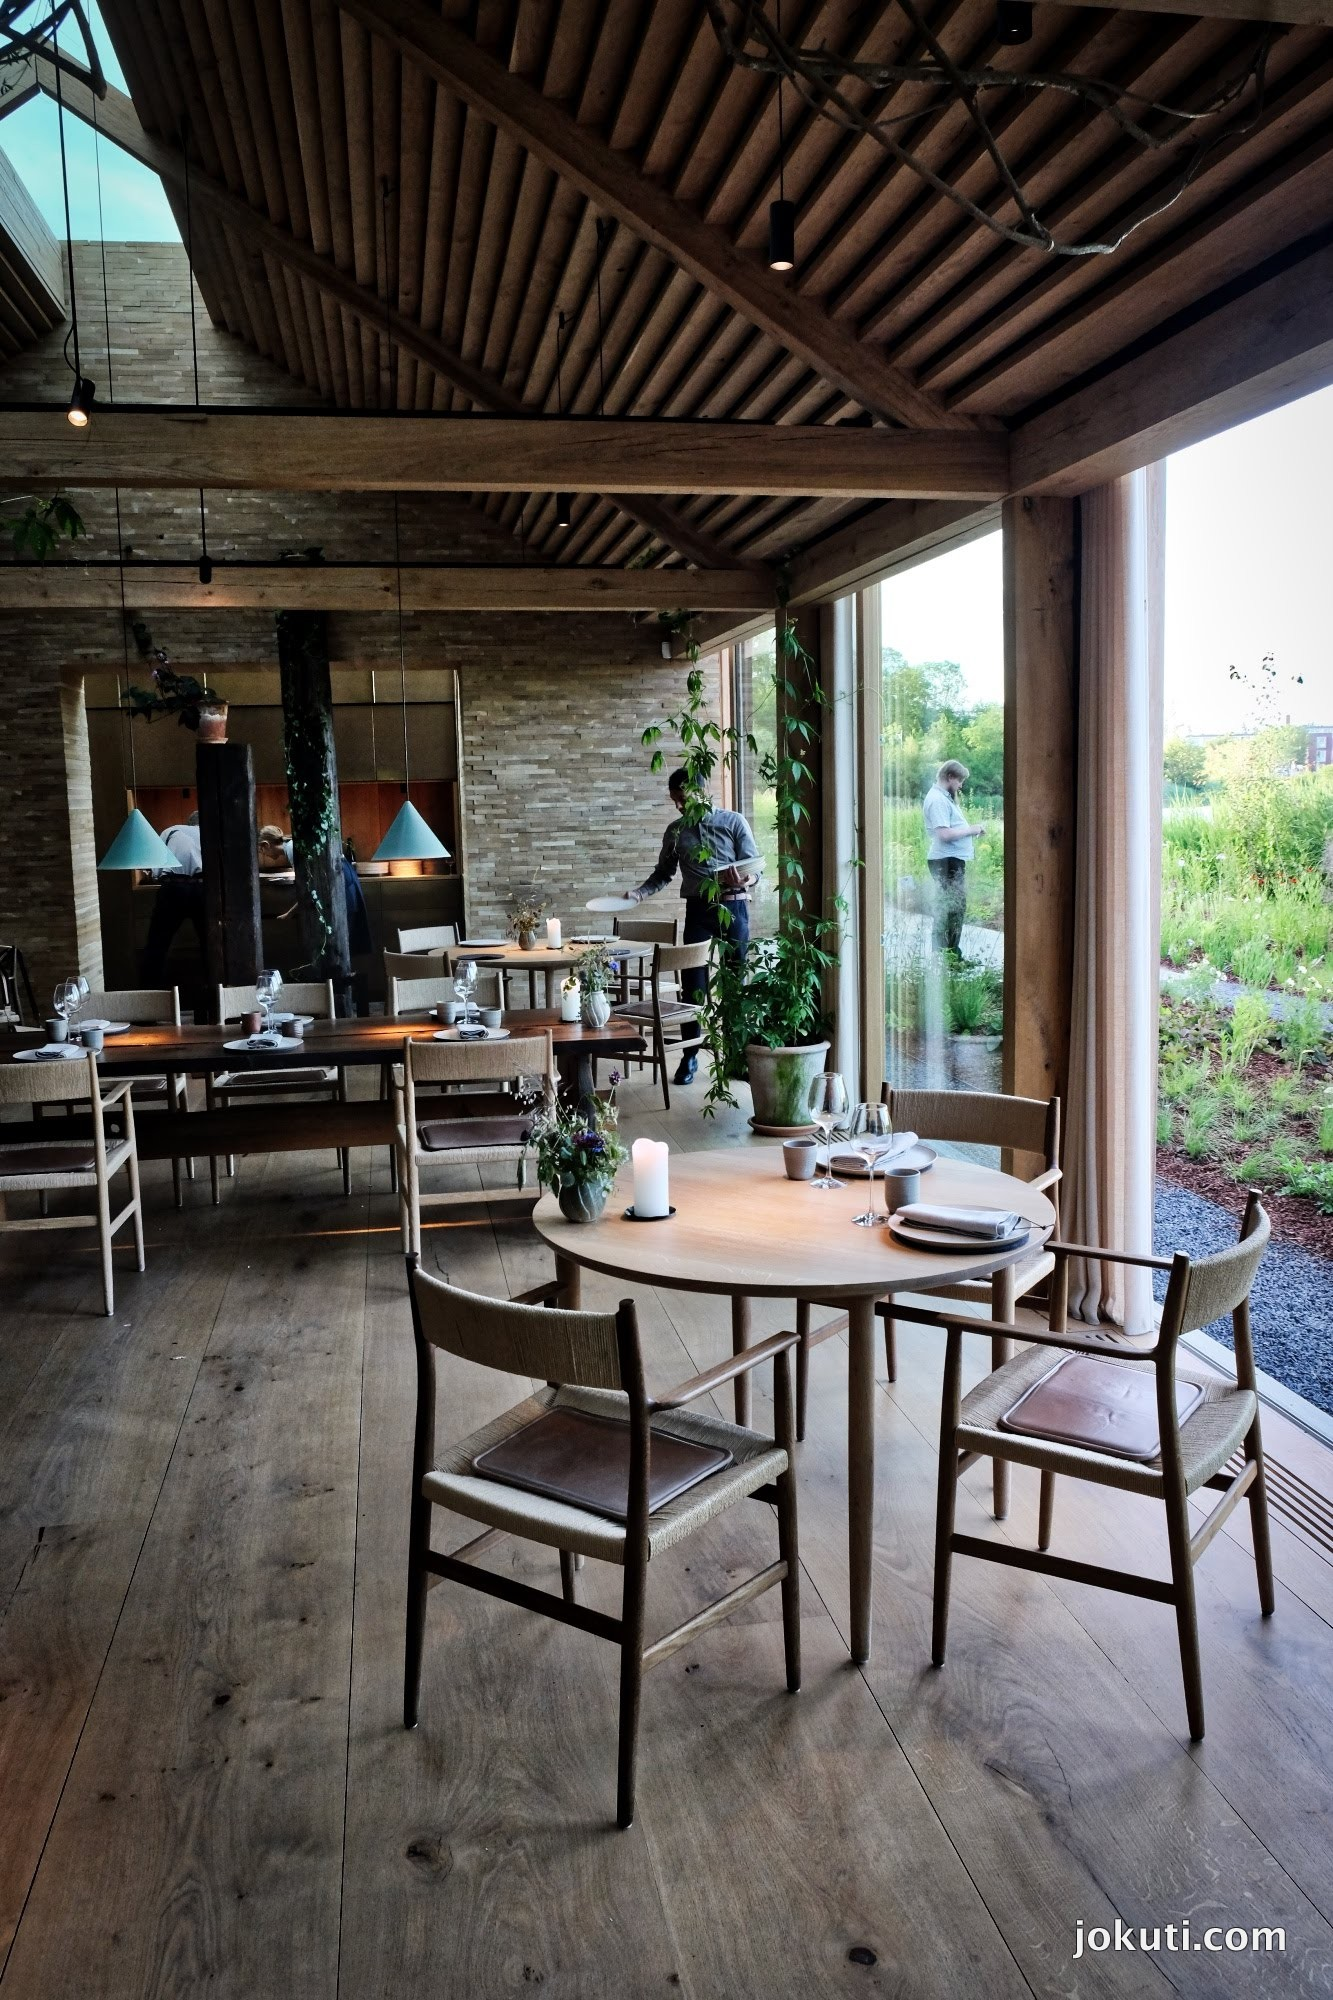 dscf6655_noma_copenhagen_vegeterian_plant_restaurant_redzepi_jokuti_vilagevo_l.jpg